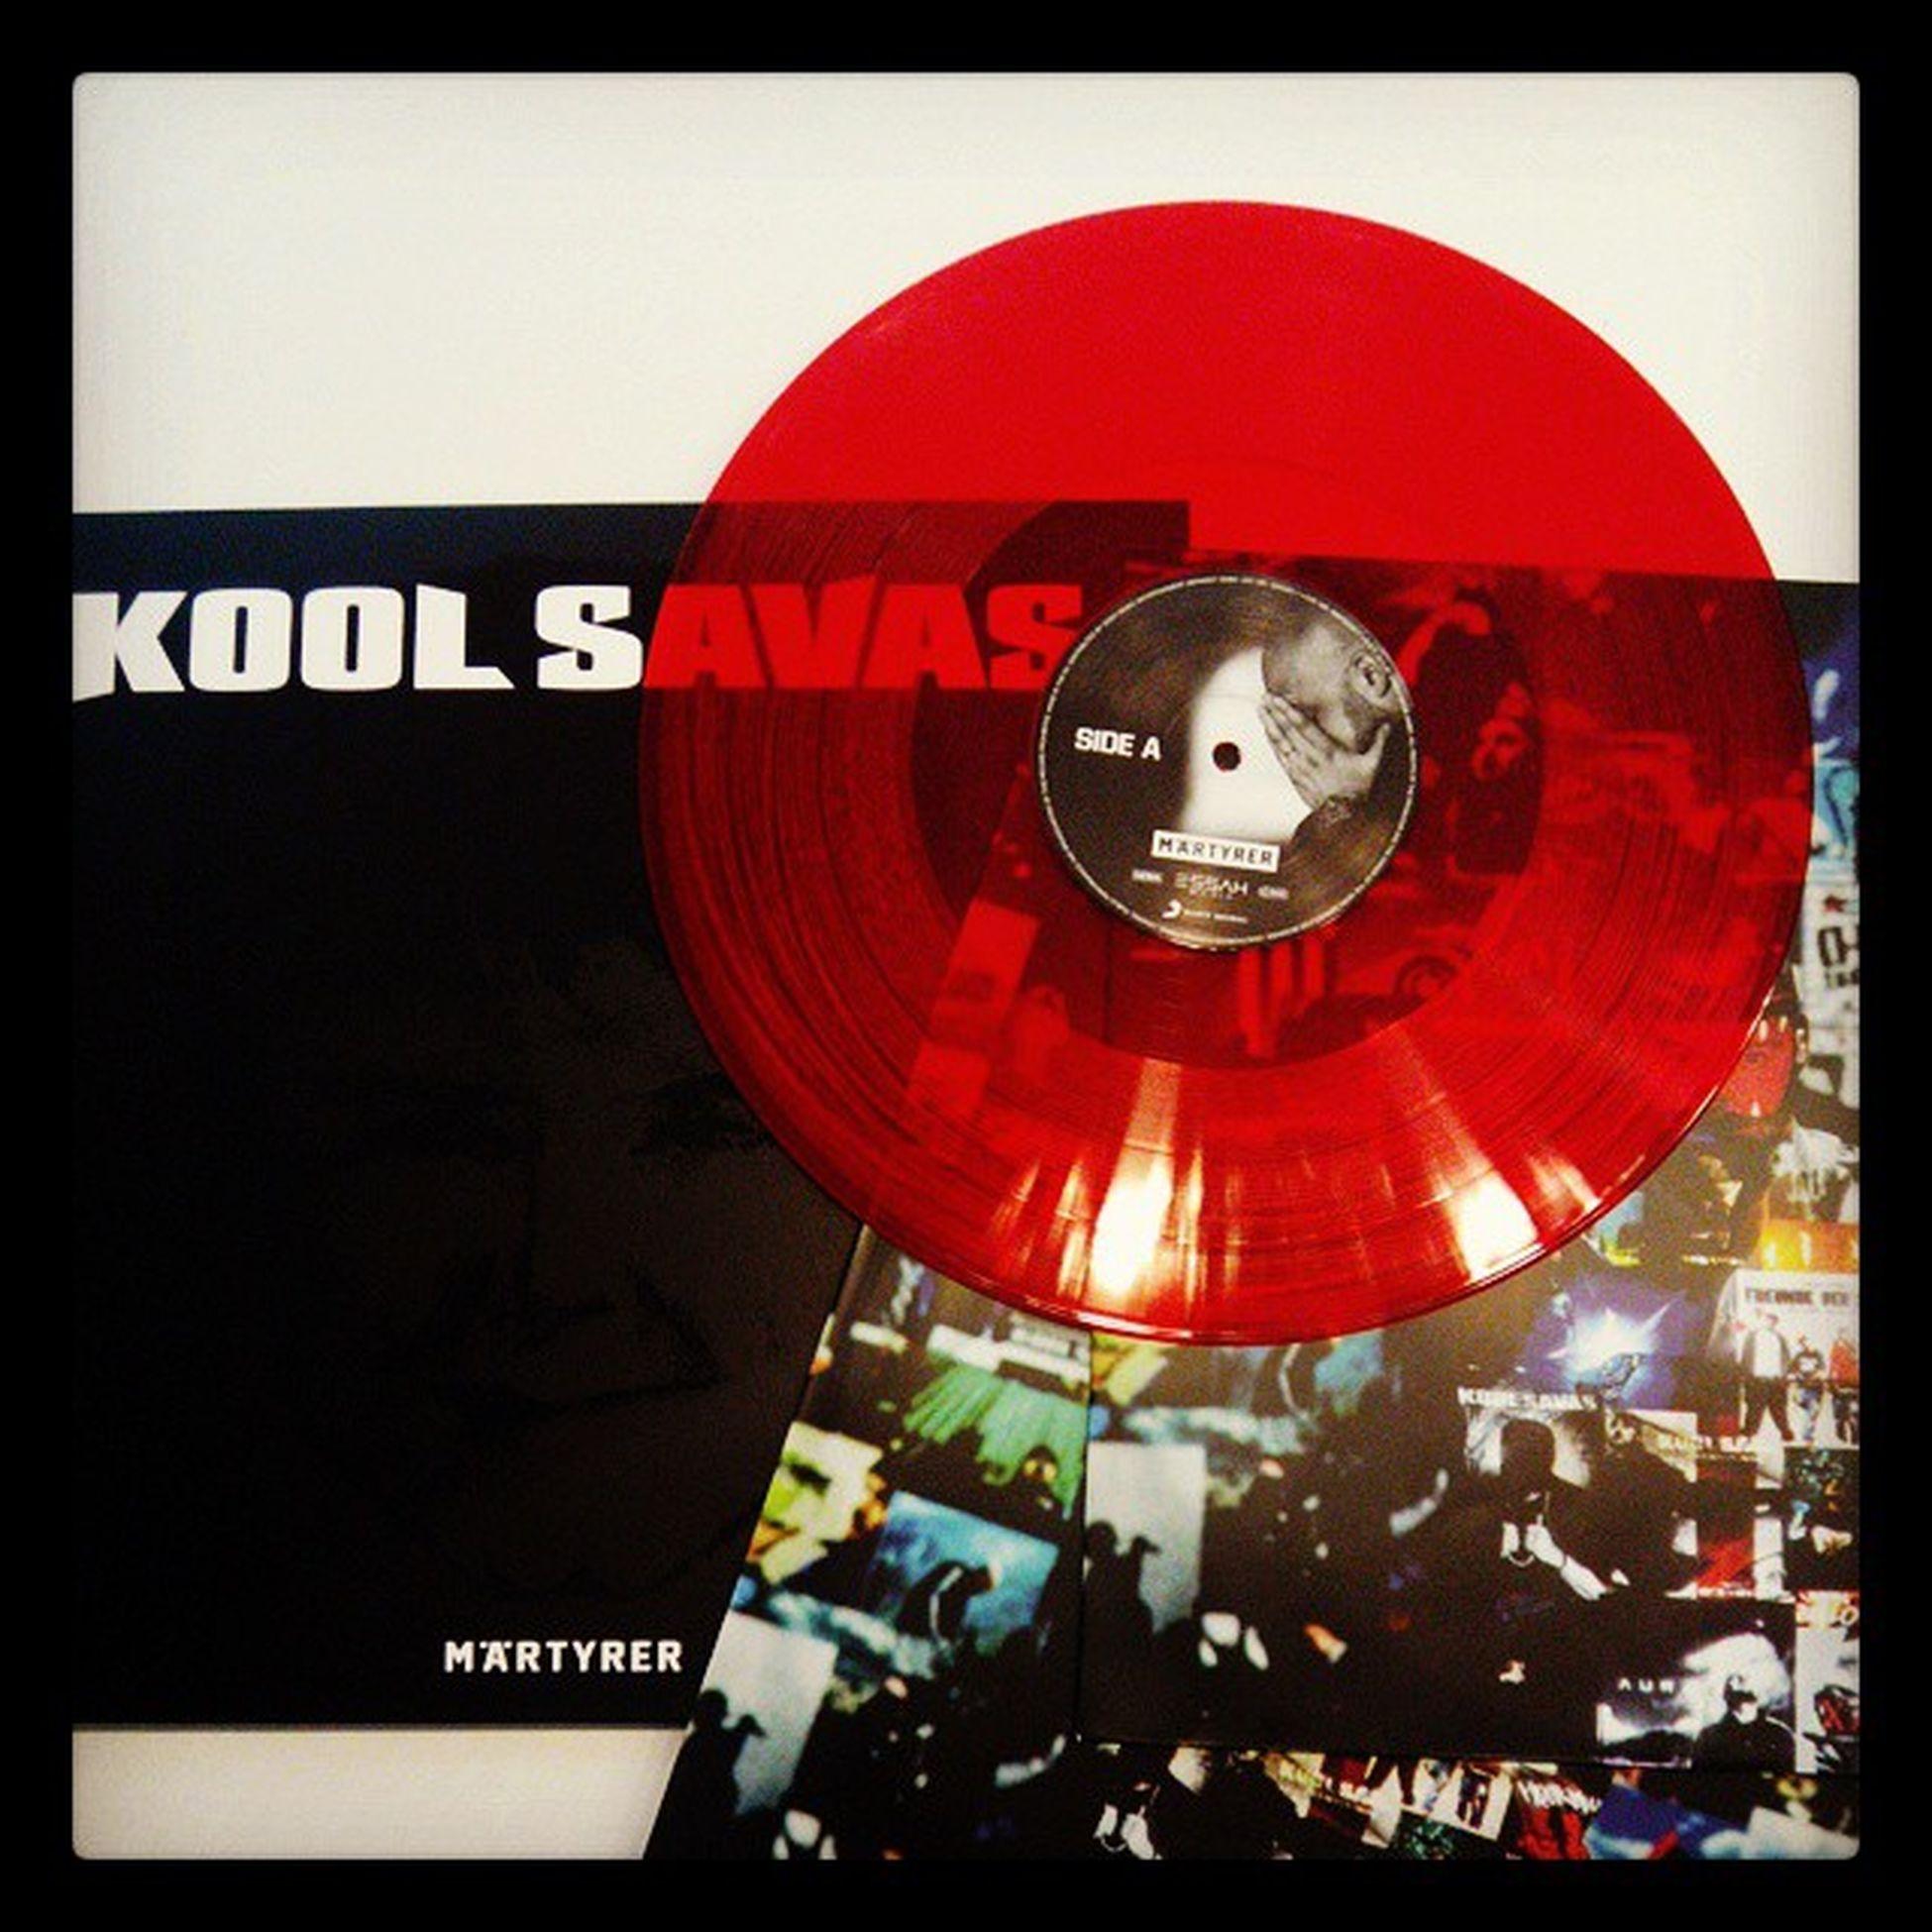 Da isse... Koolsavas Maertyrer Red Vinyl redvinyl redgold blackgold rap